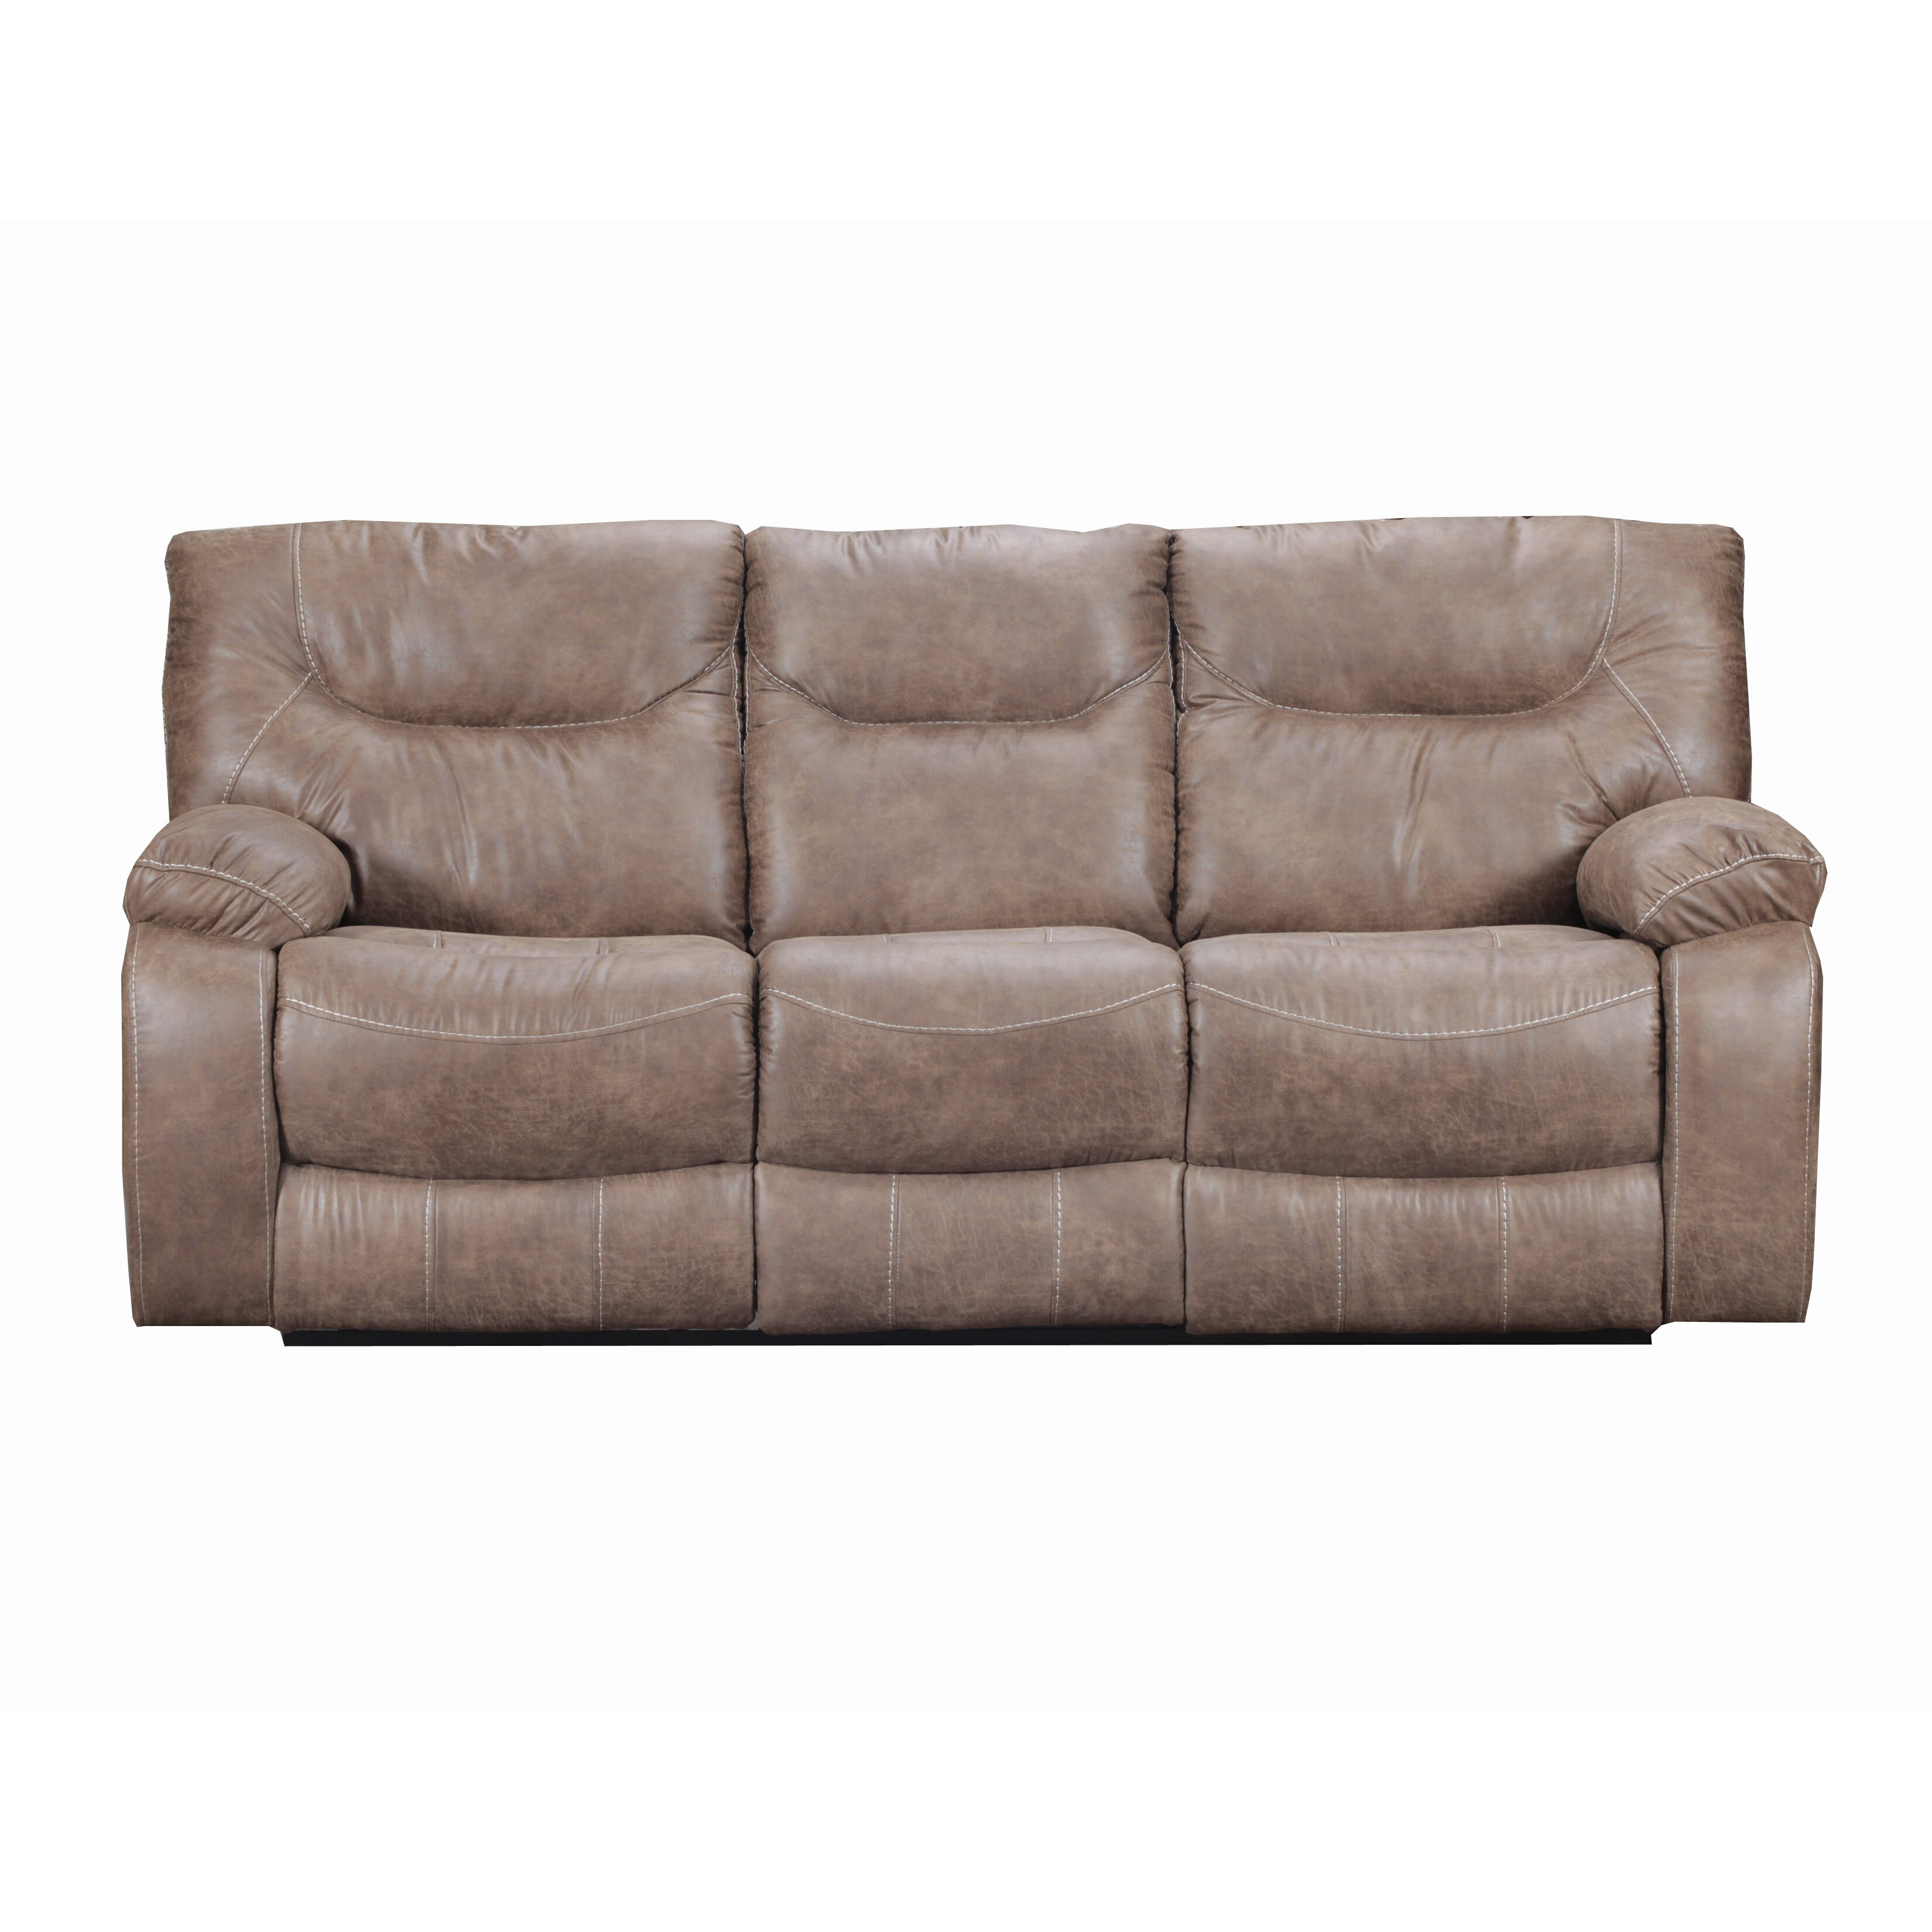 Loon Peak Simmons Upholstery El Capitan Double Motion Reclining Sofa Reviews Wayfair